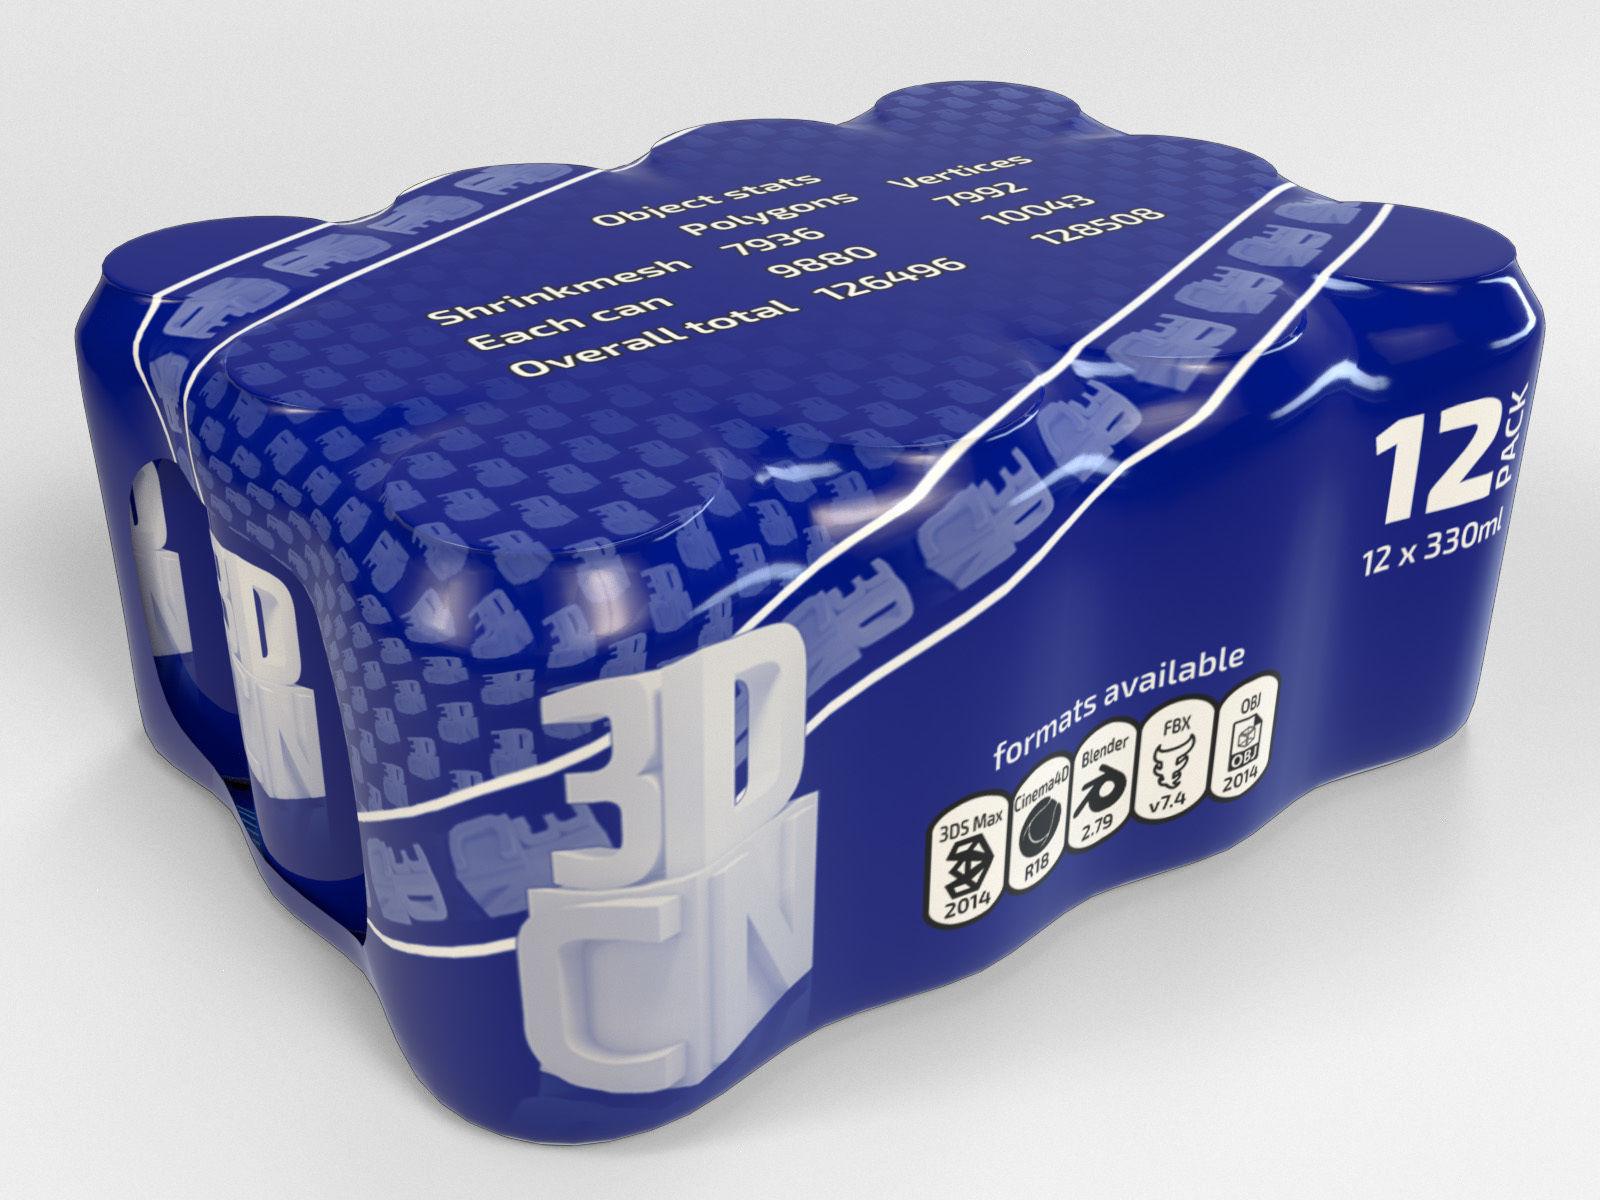 12 pack 330ml shrinkwrapped beverage cans